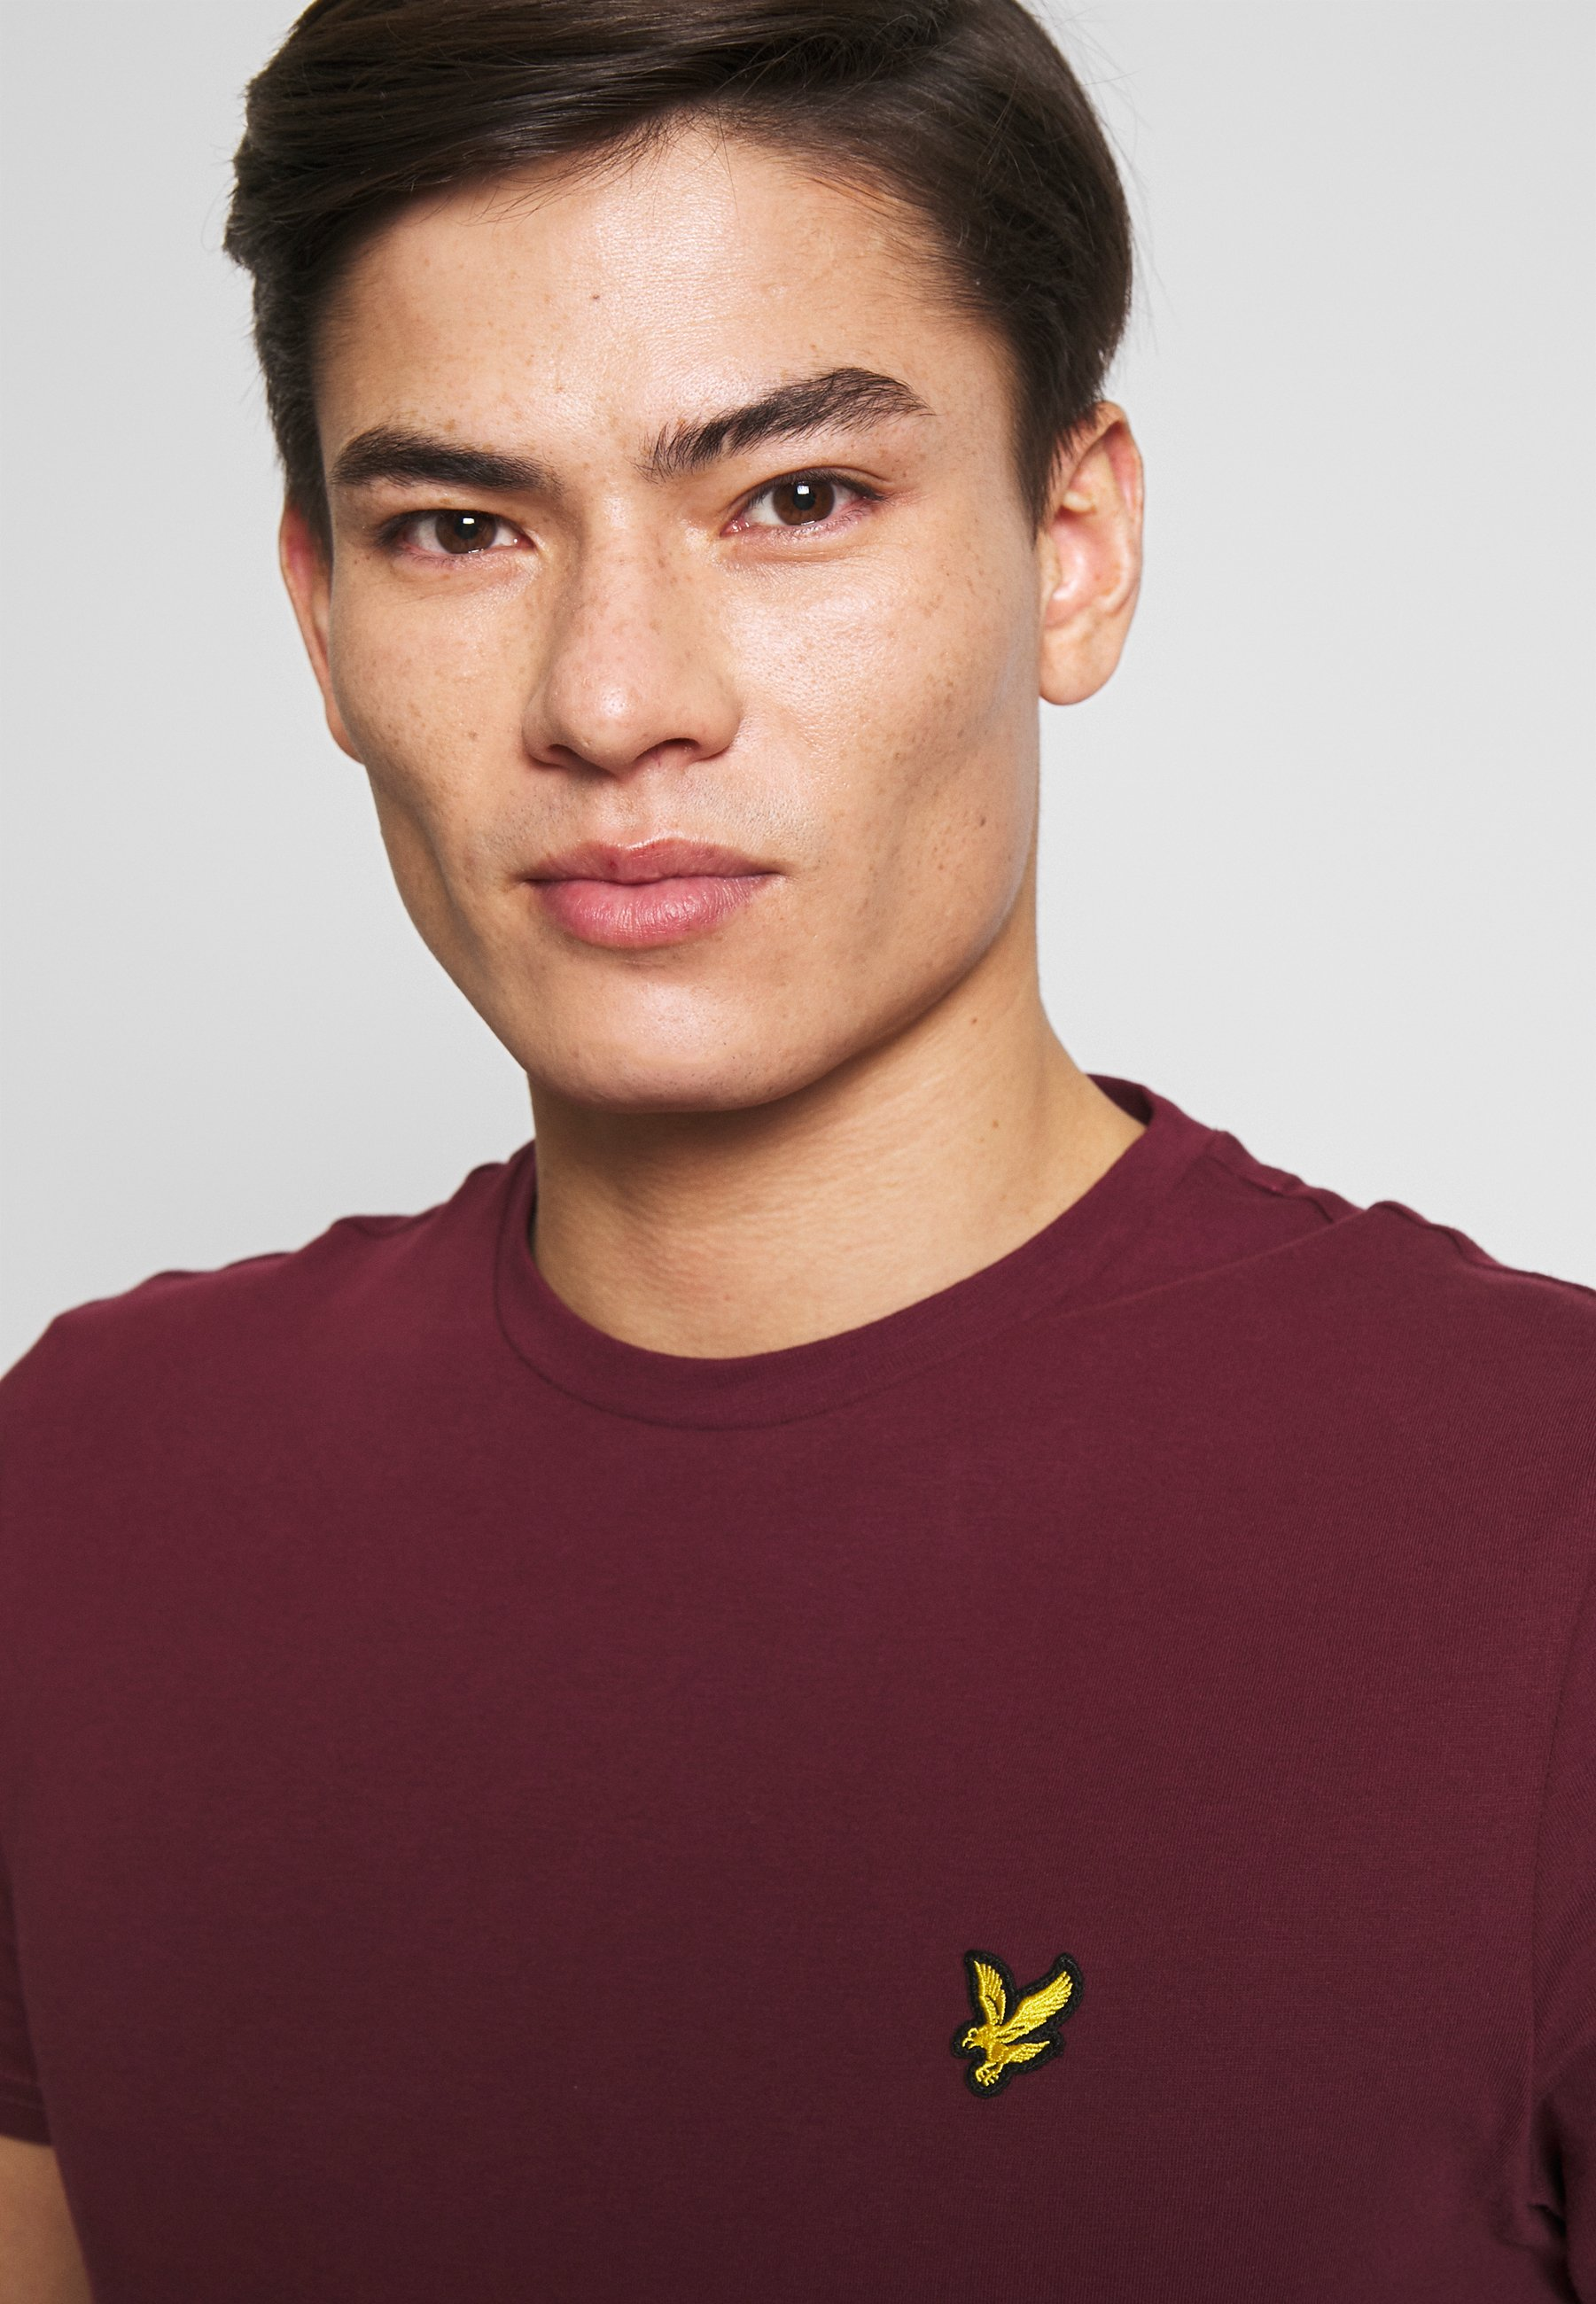 Lyle & Scott Plain - T-shirts Merlot/vinrød